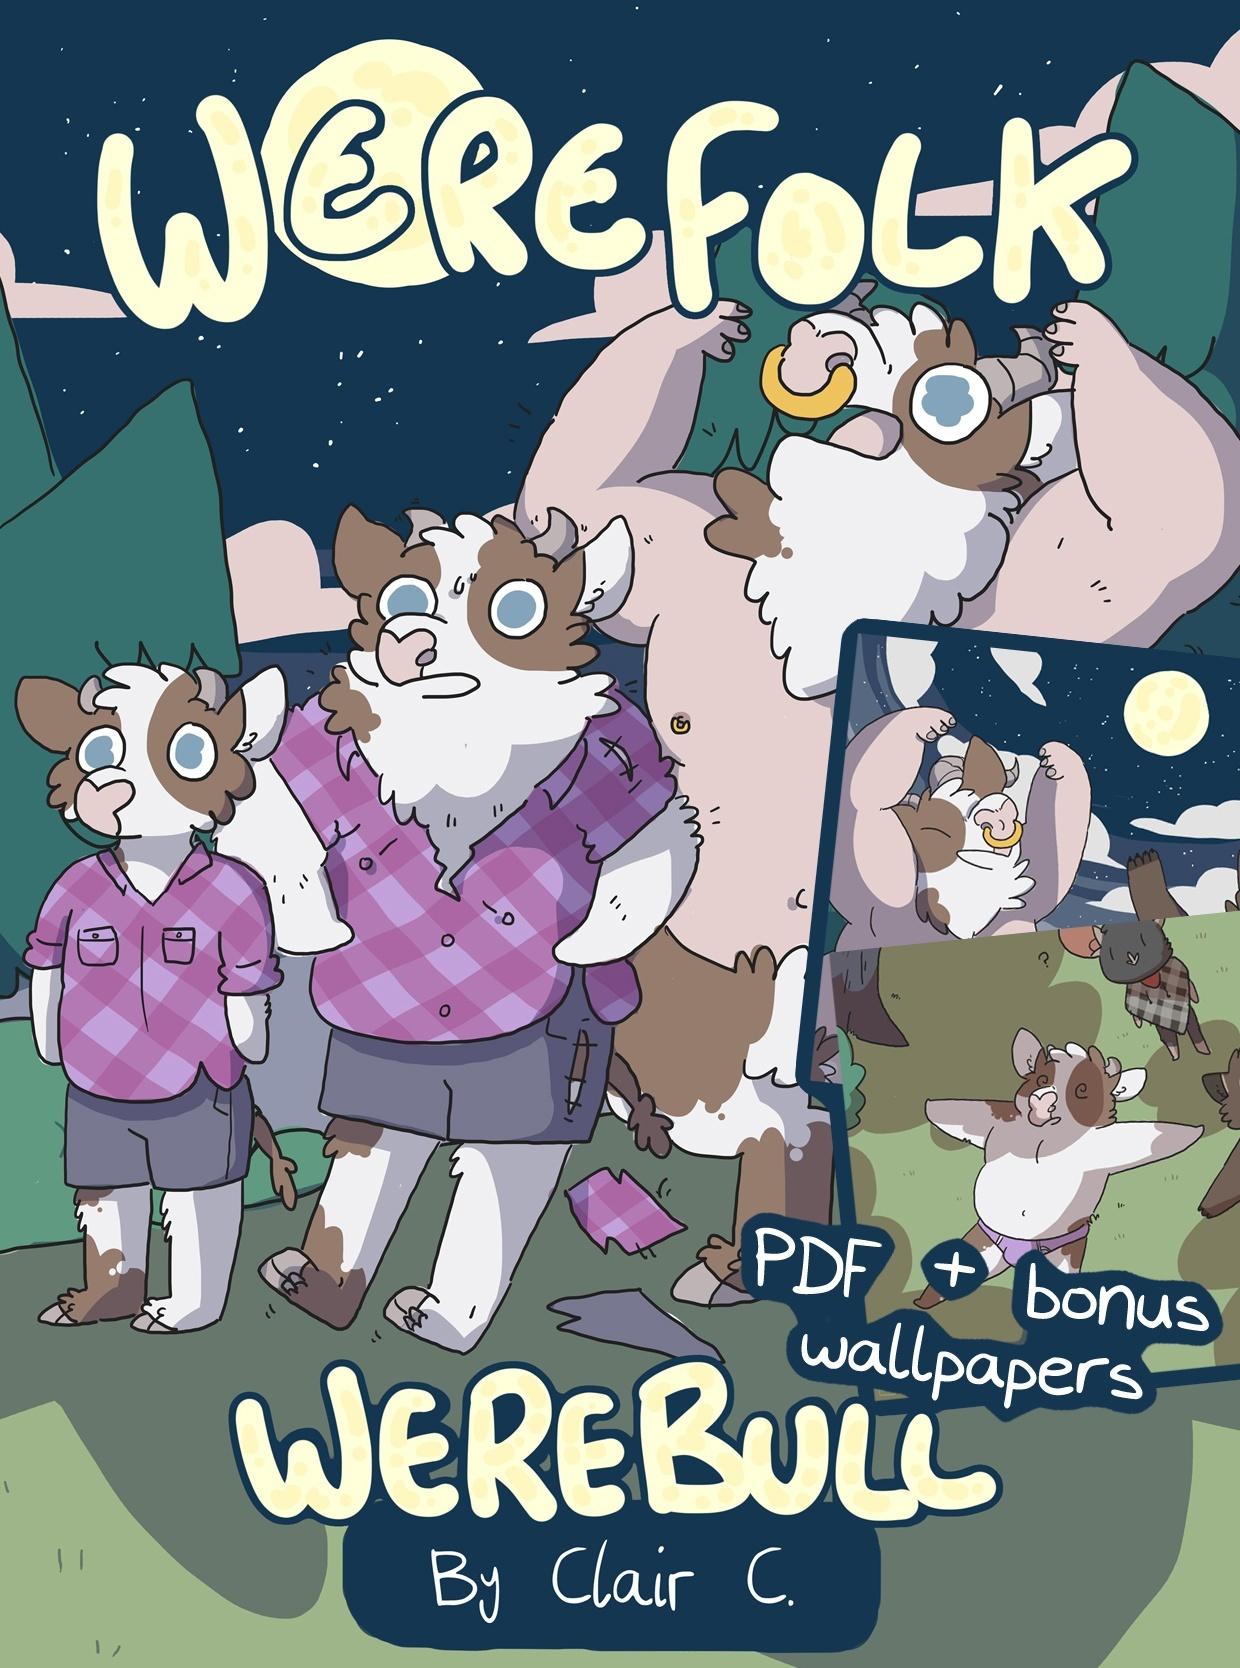 Werefolk: Werebull PDF & Wallpaper Bundle